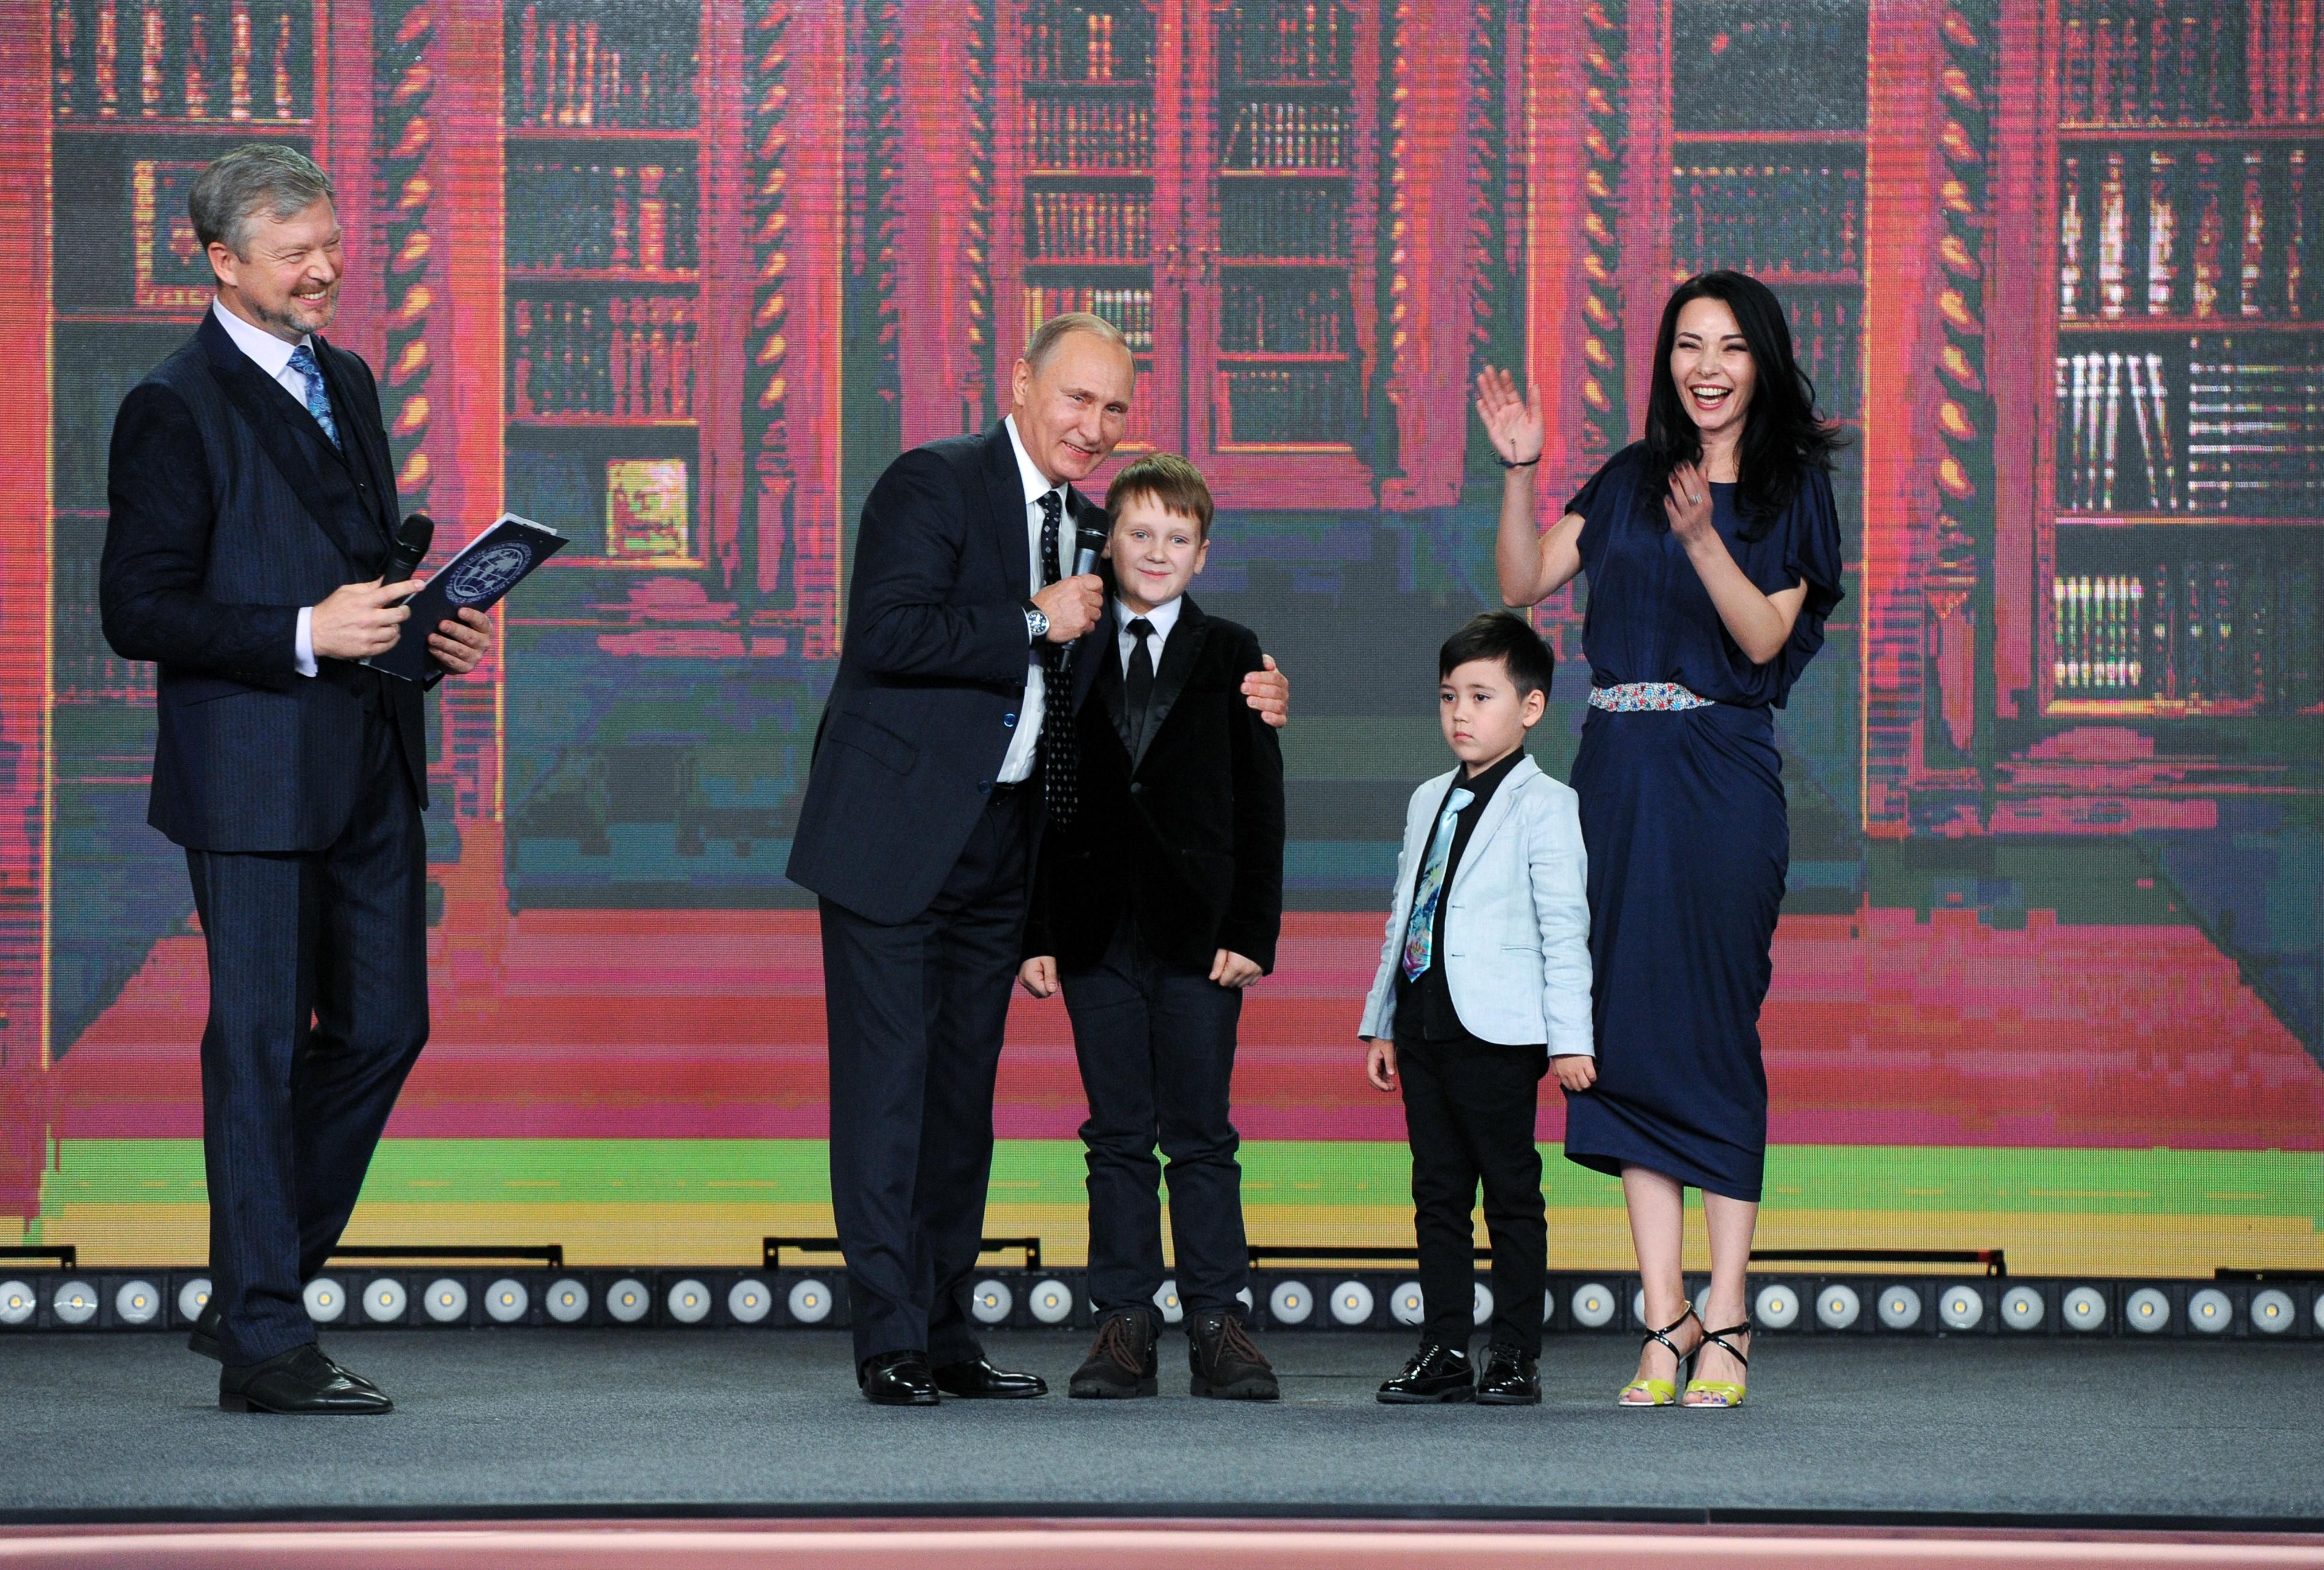 <p><span>Фото &copy; РИА Новости/Михаил Клементьев</span></p>